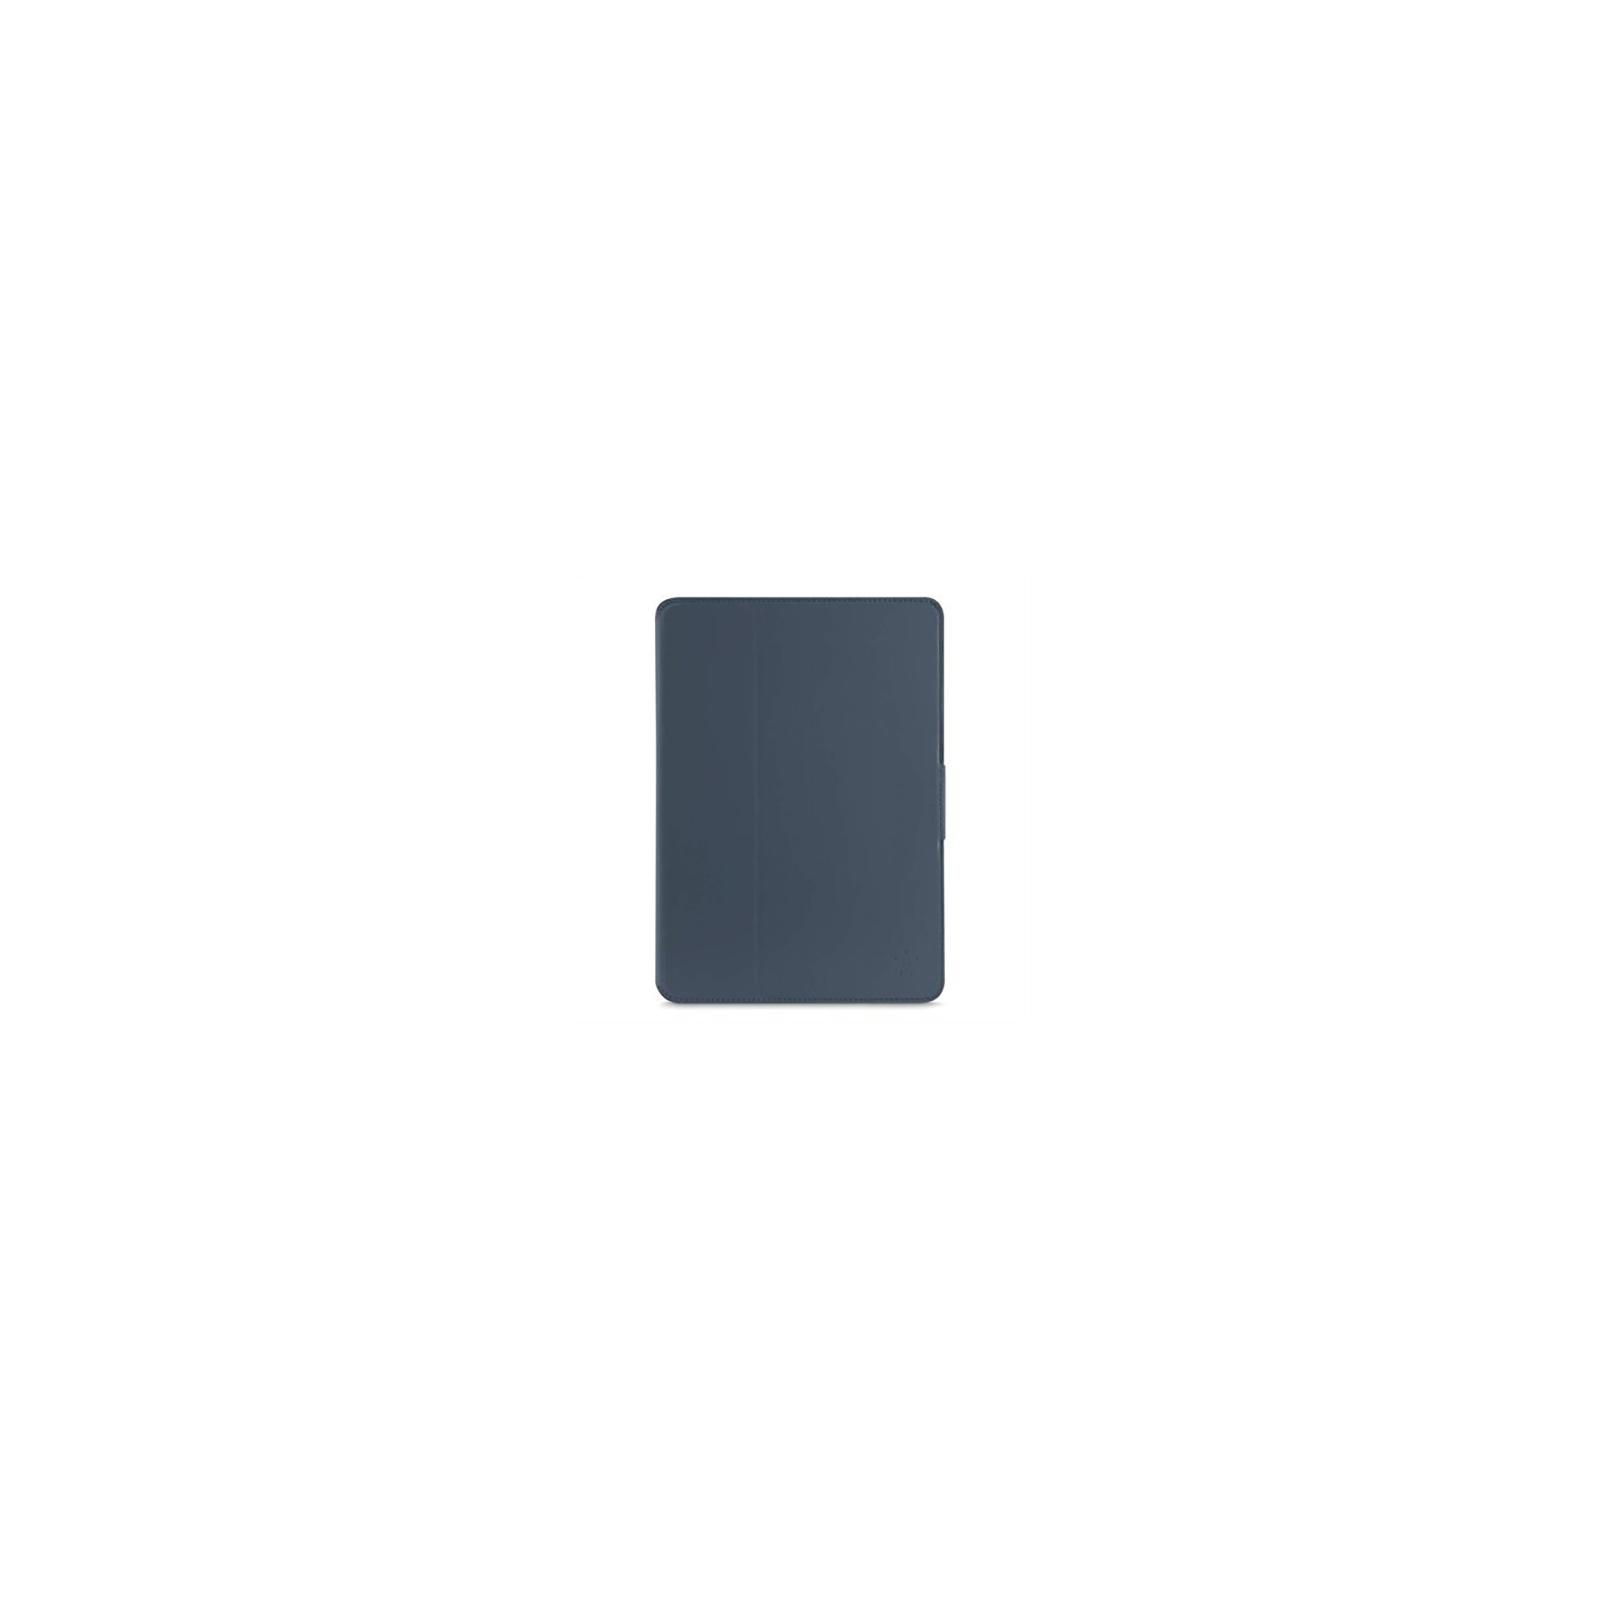 Чехол для планшета Belkin iPad Air Slate FreeStyle Cover (F7N100B2C01)